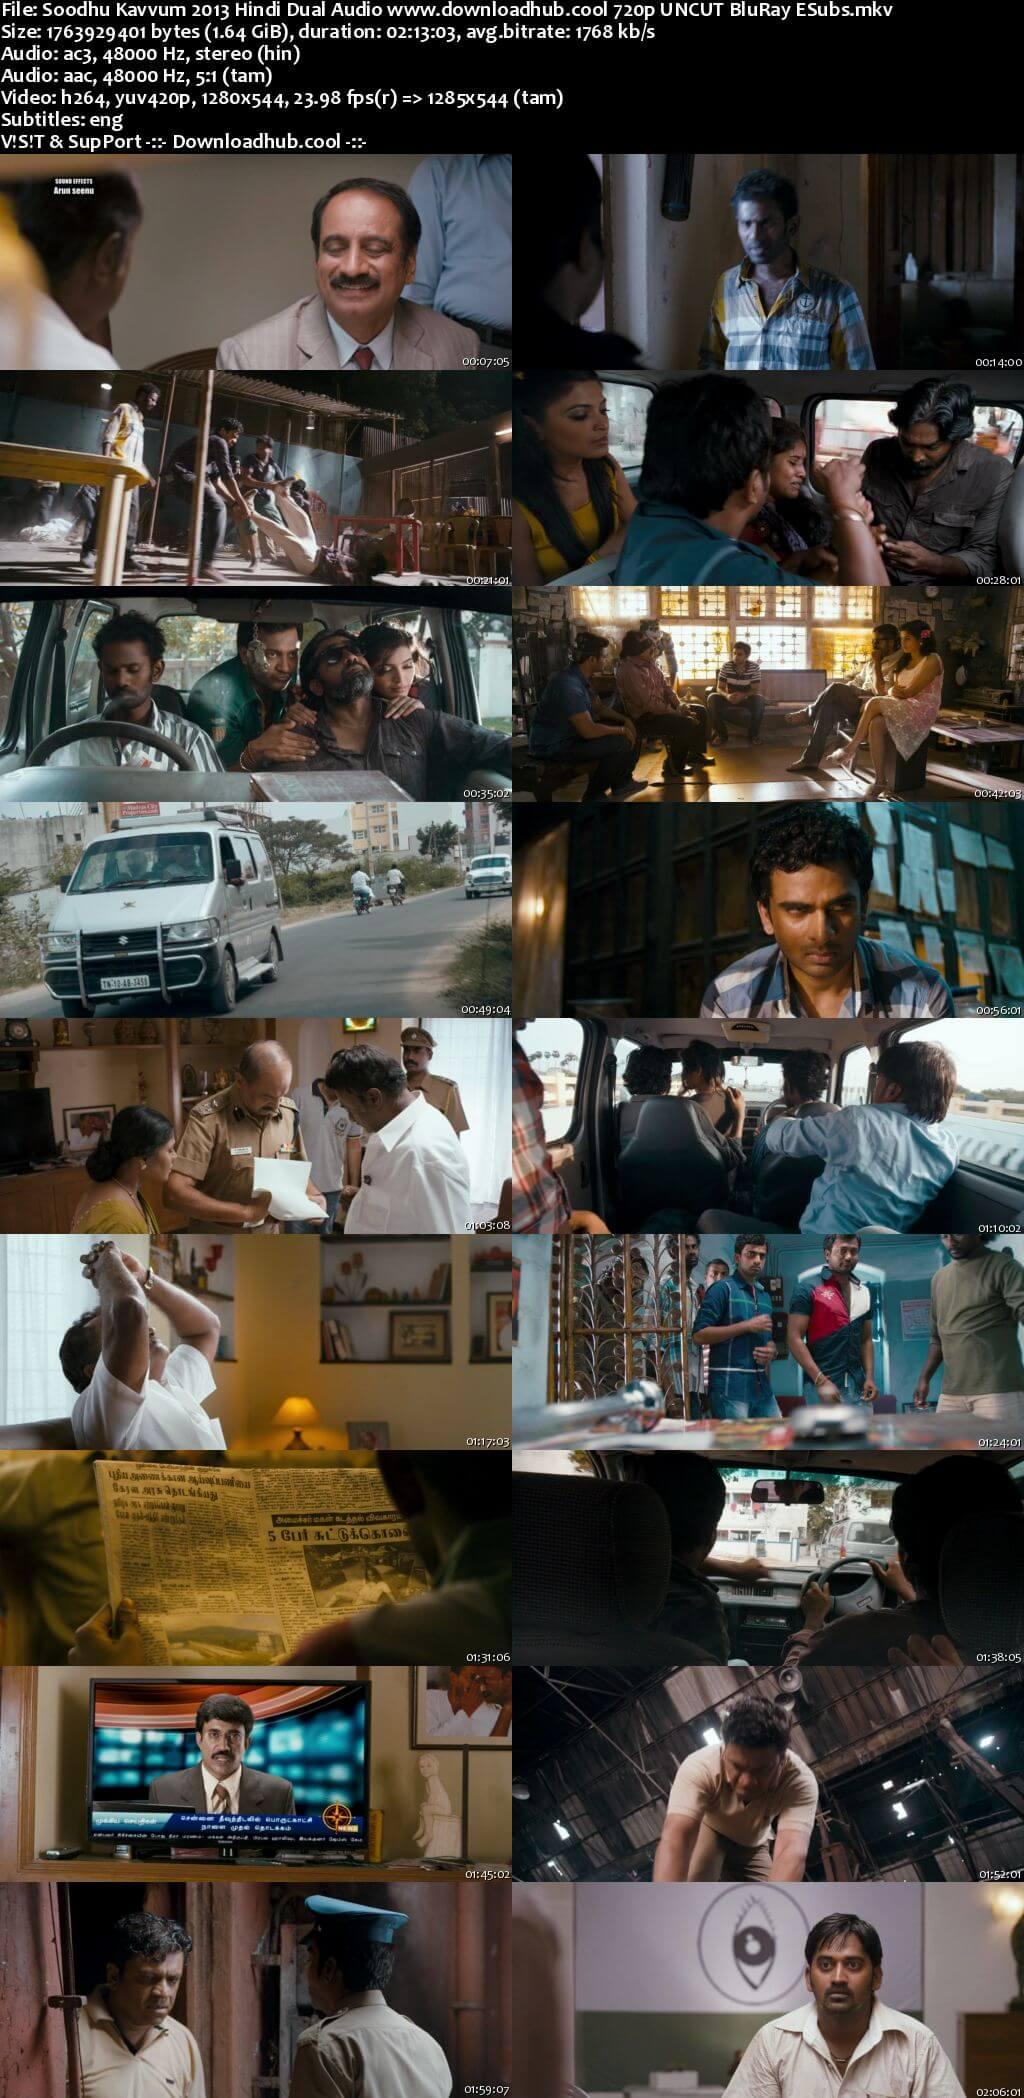 Soodhu Kavvum 2013 Hindi Dual Audio 720p UNCUT BluRay ESubs